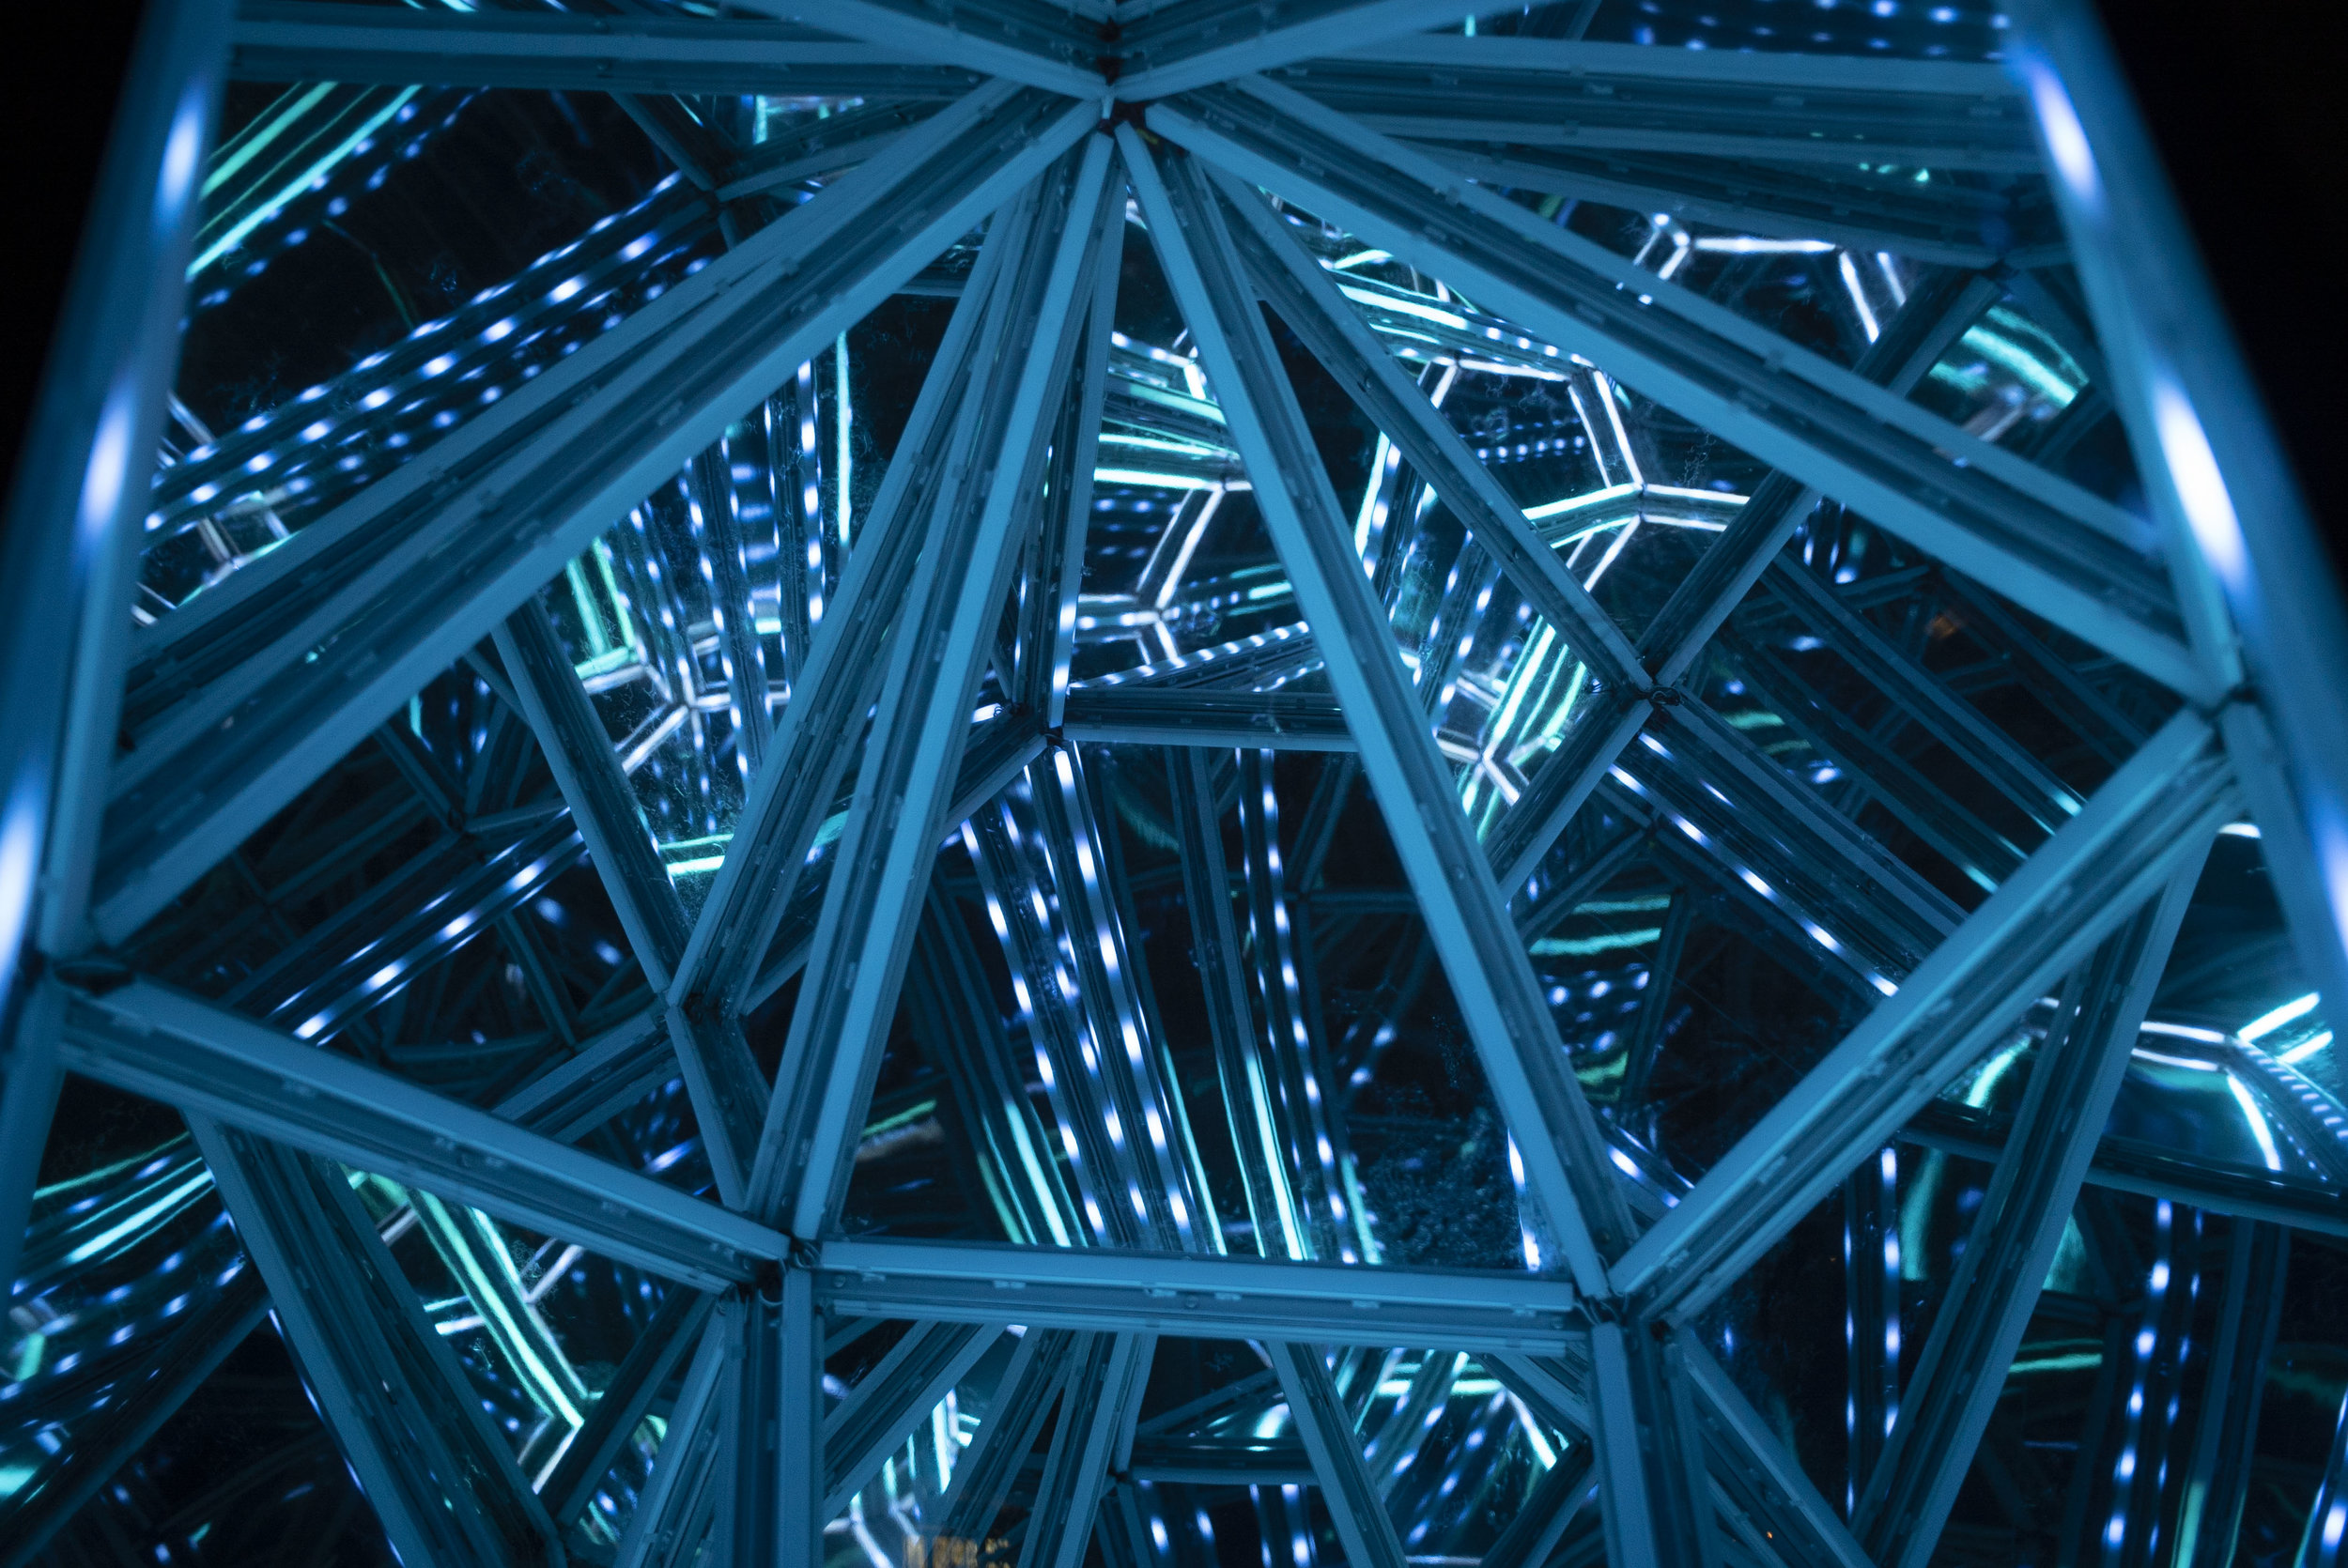 Infinity Crystal